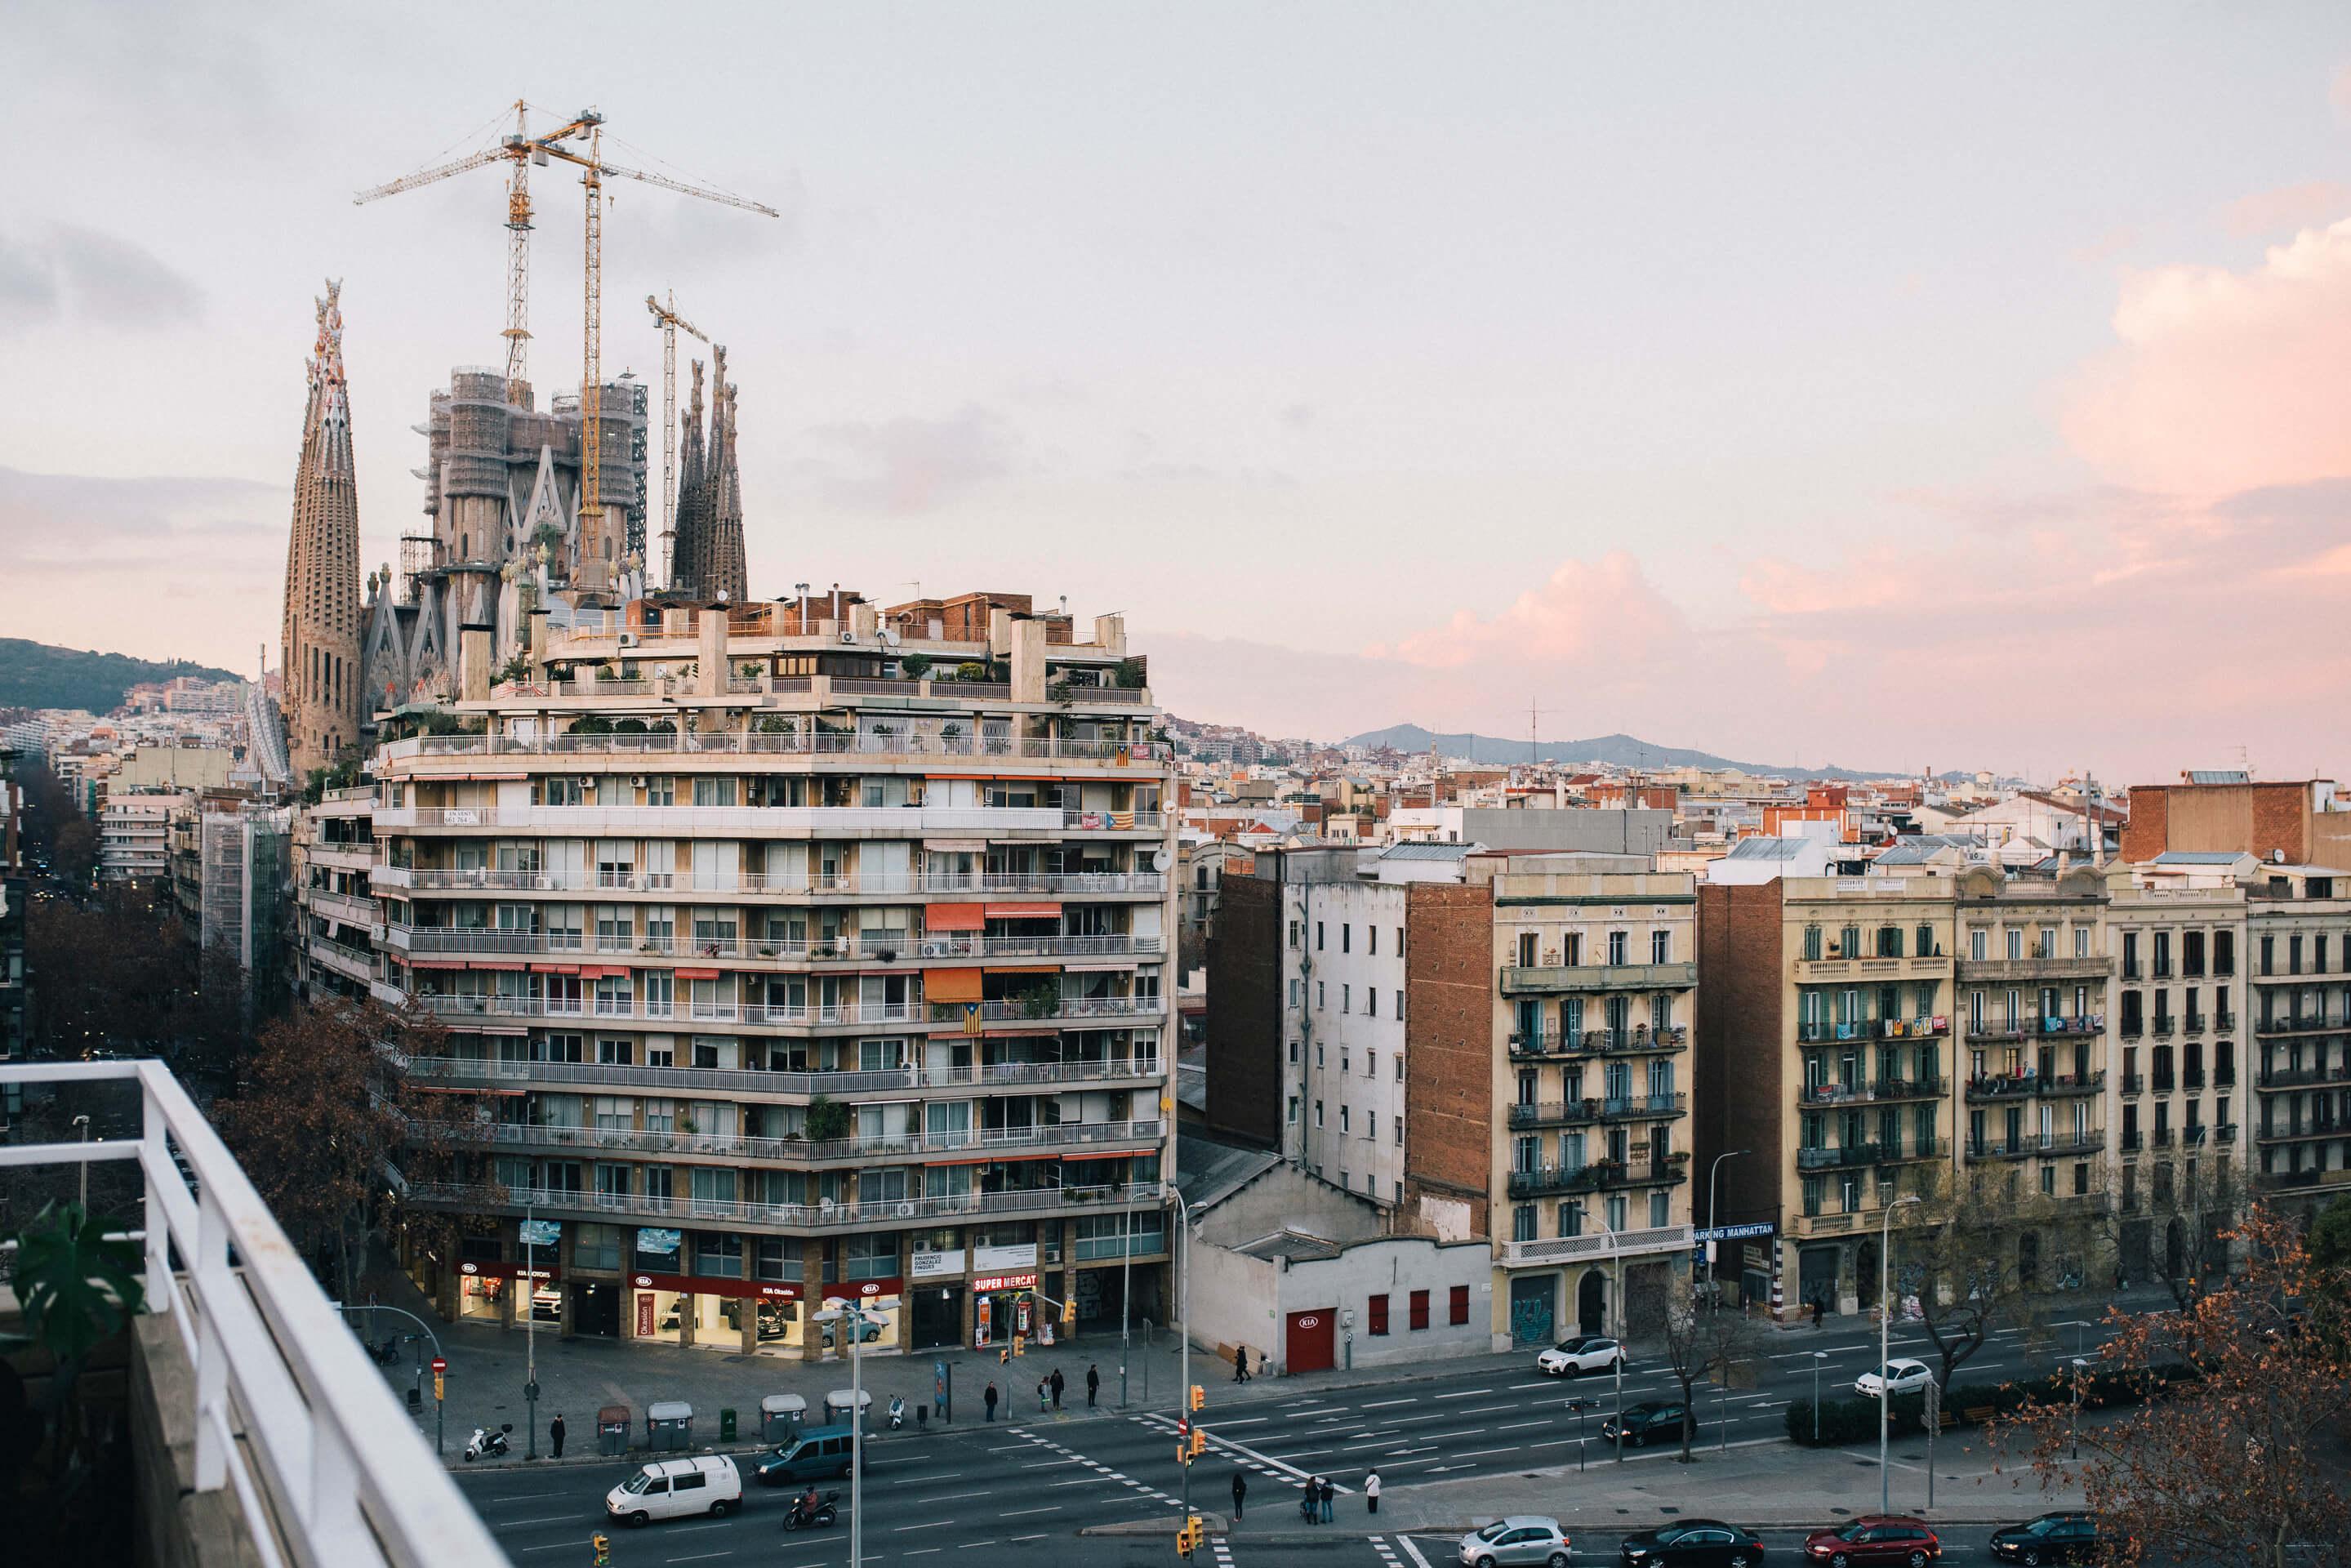 Cloudworks Sagrada Familia, Barcelona